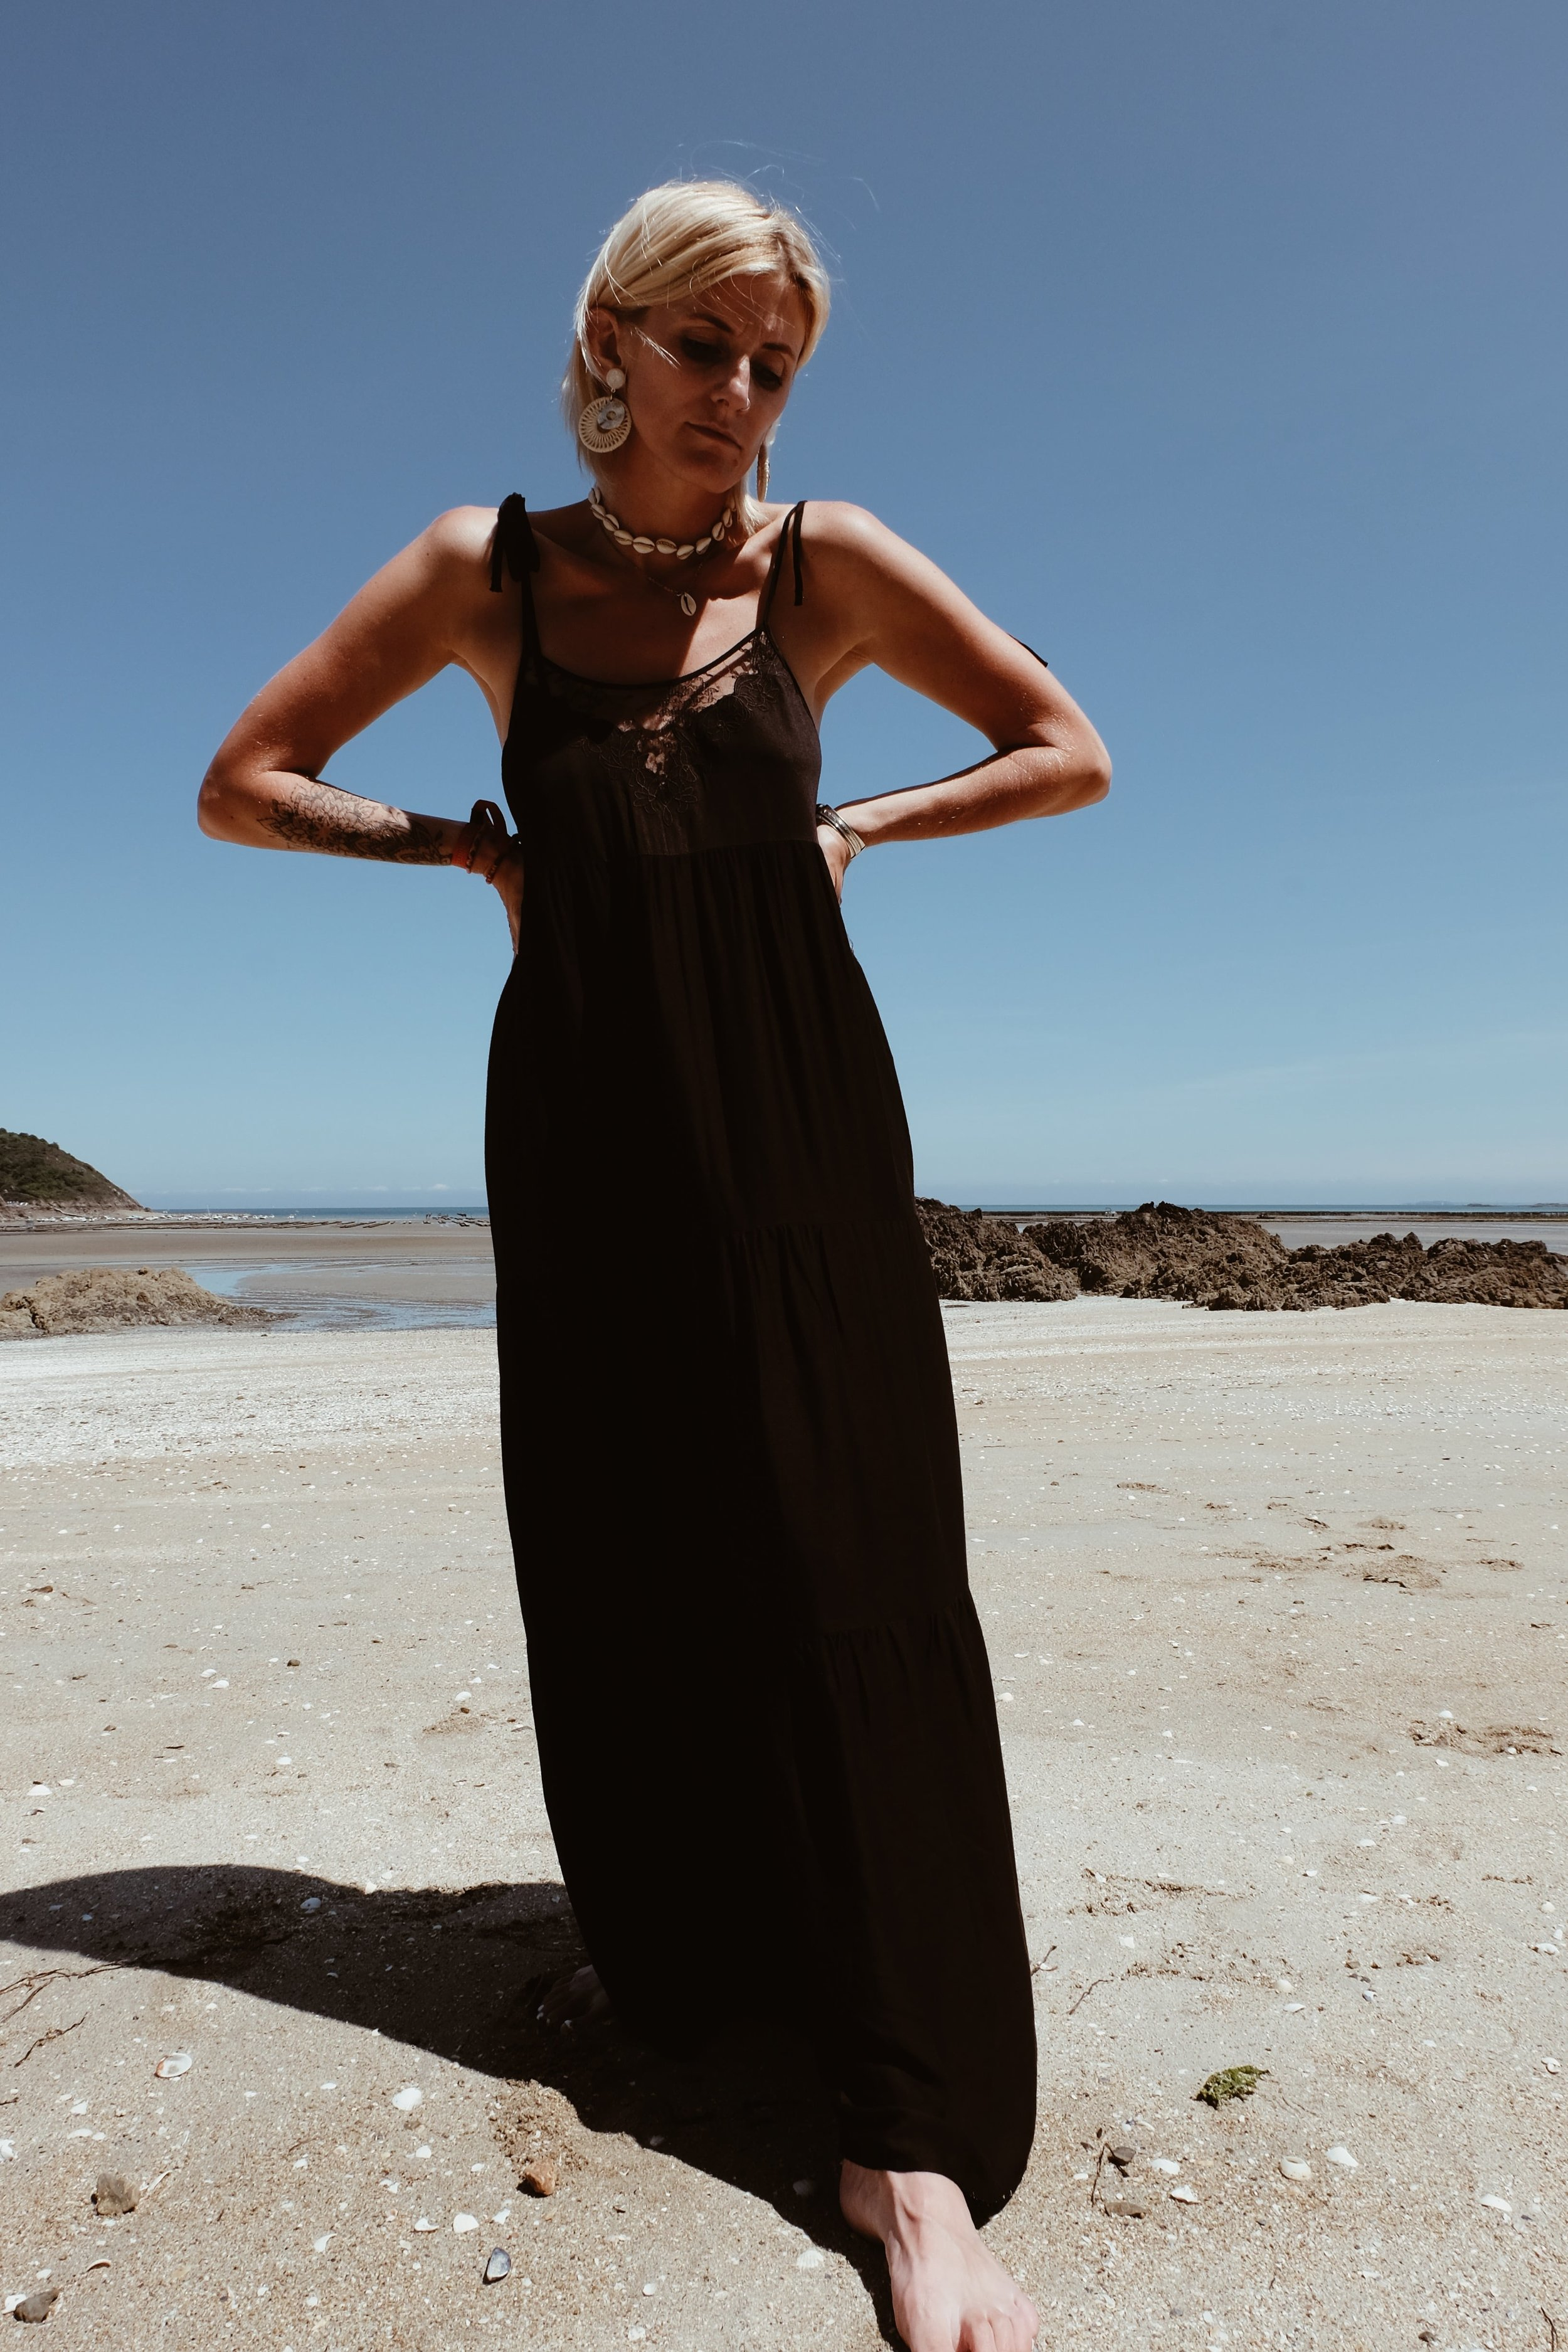 Carnet Sauvage - robe longue noire Stradivarius1-min.JPG